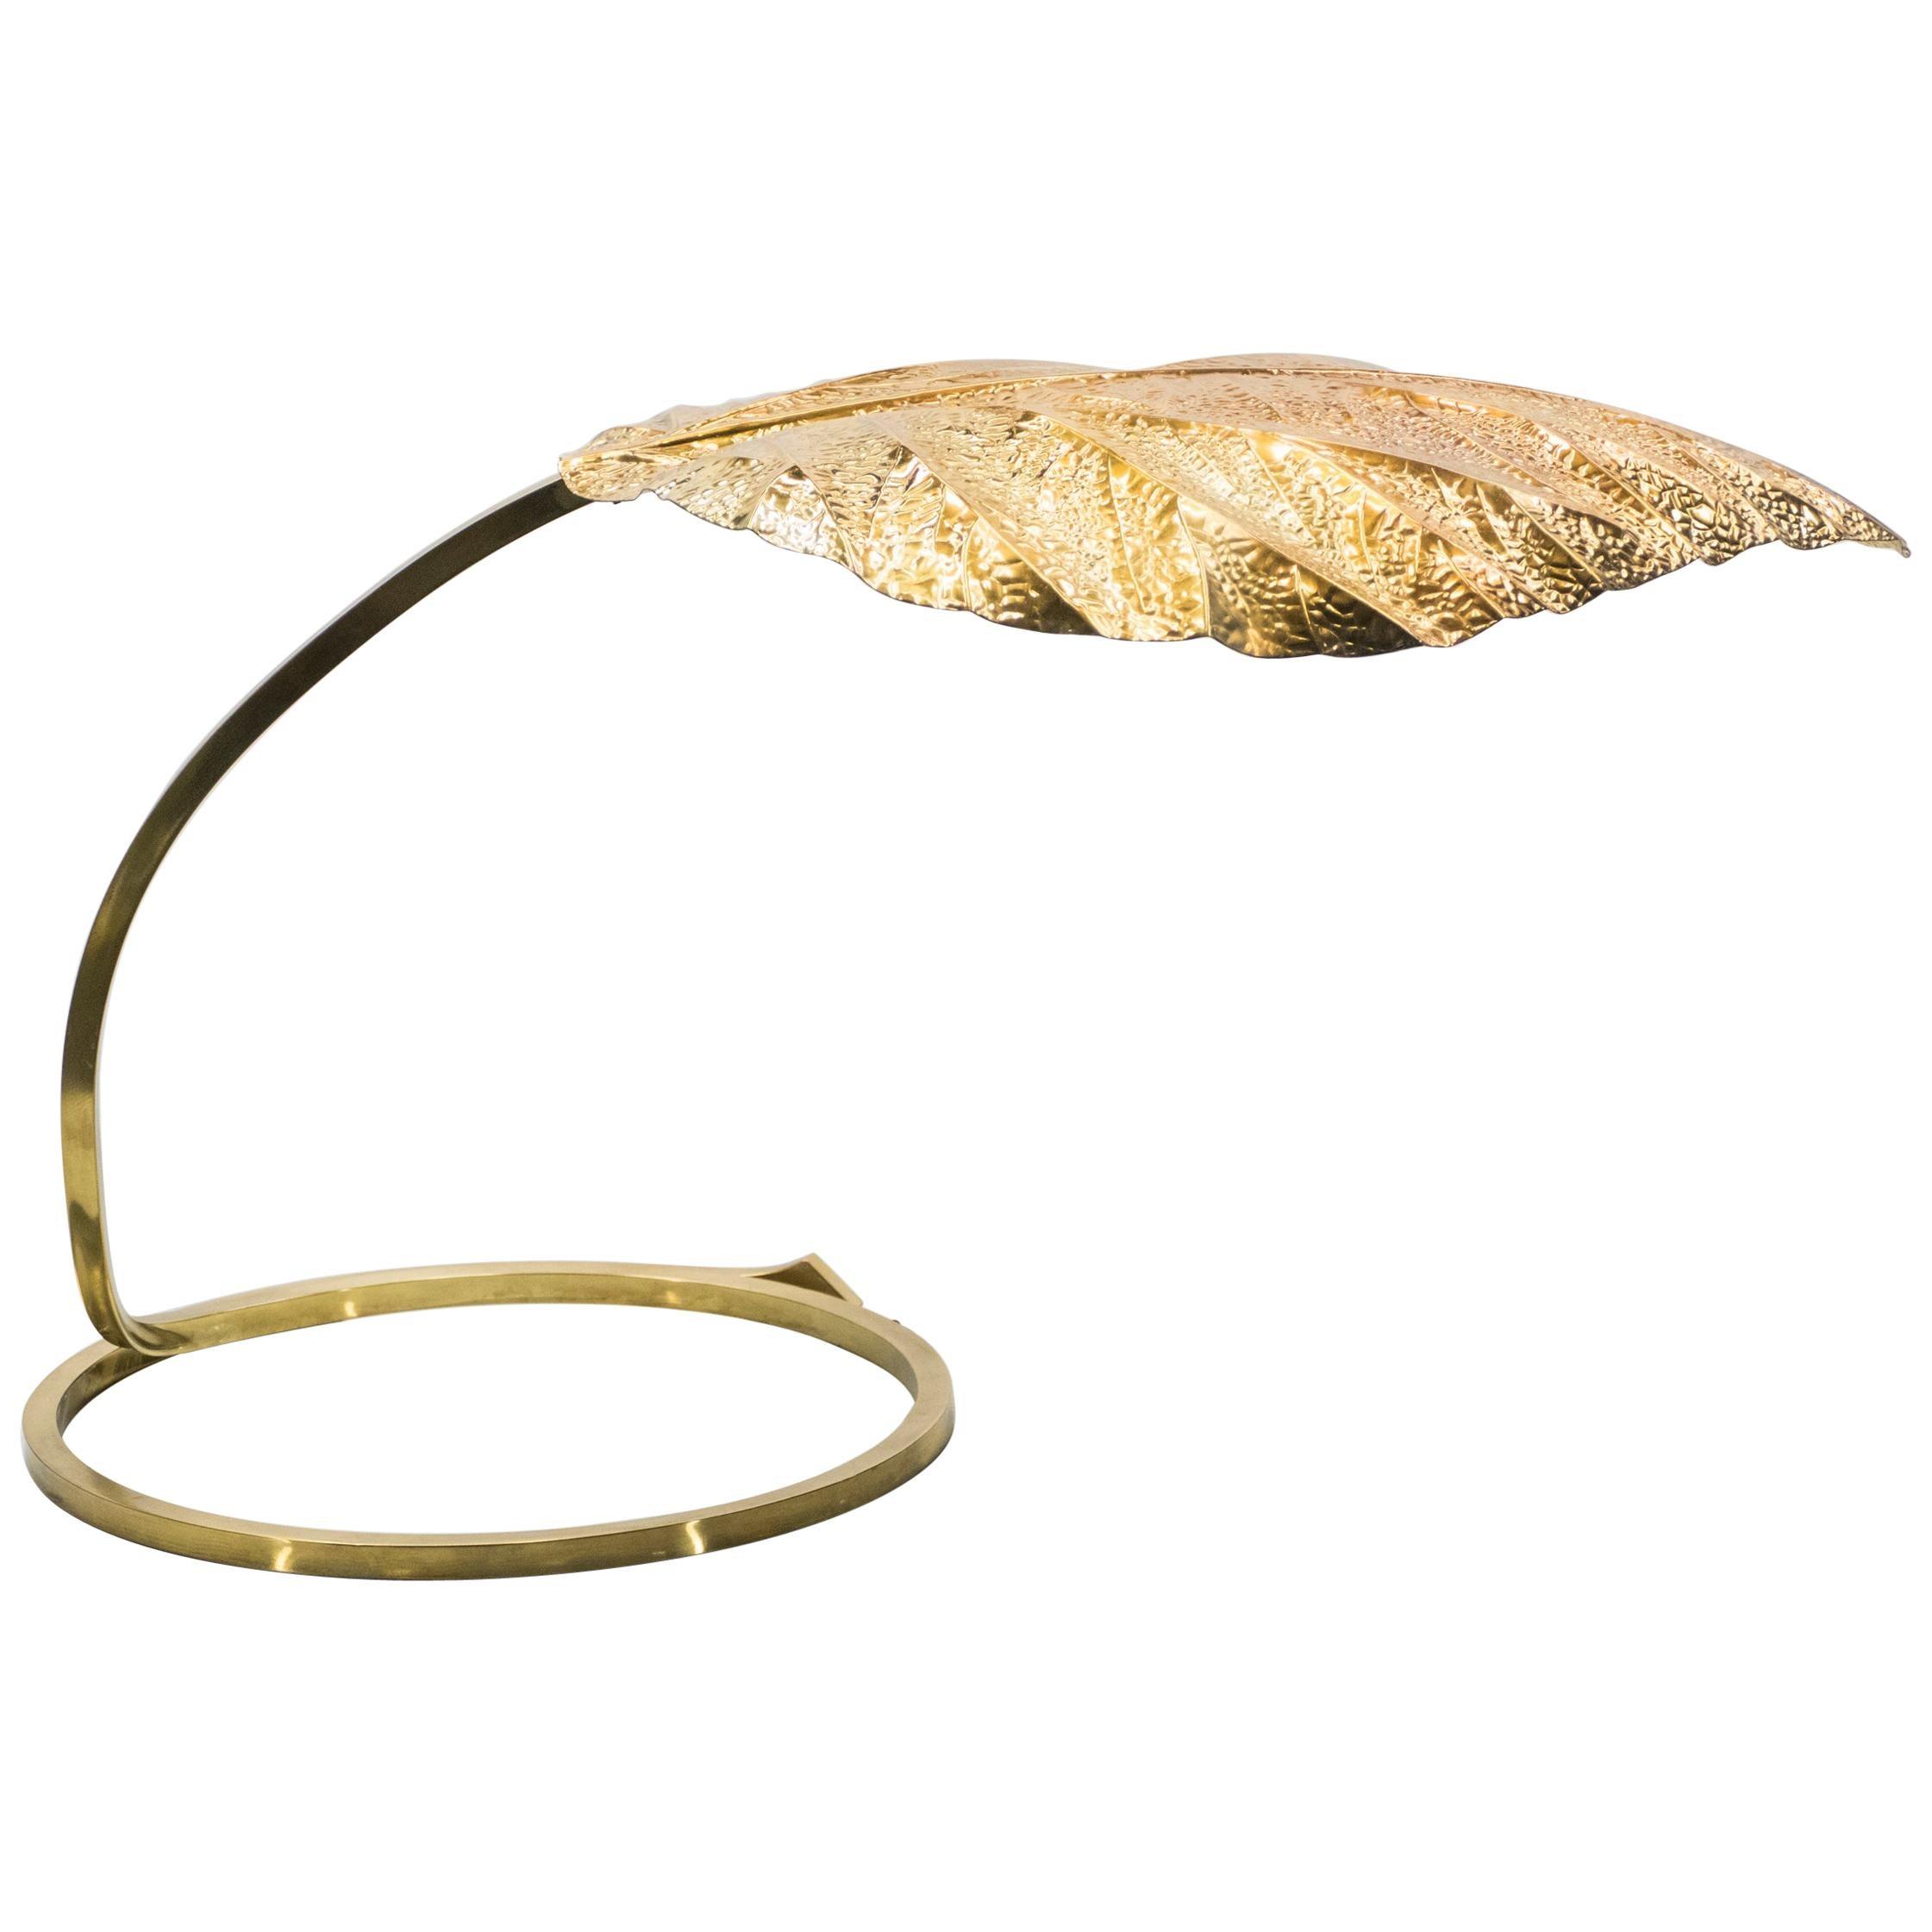 Italian Midcentury Rhubarb Brass Table Lamp Tommaso Barbi, 1970s